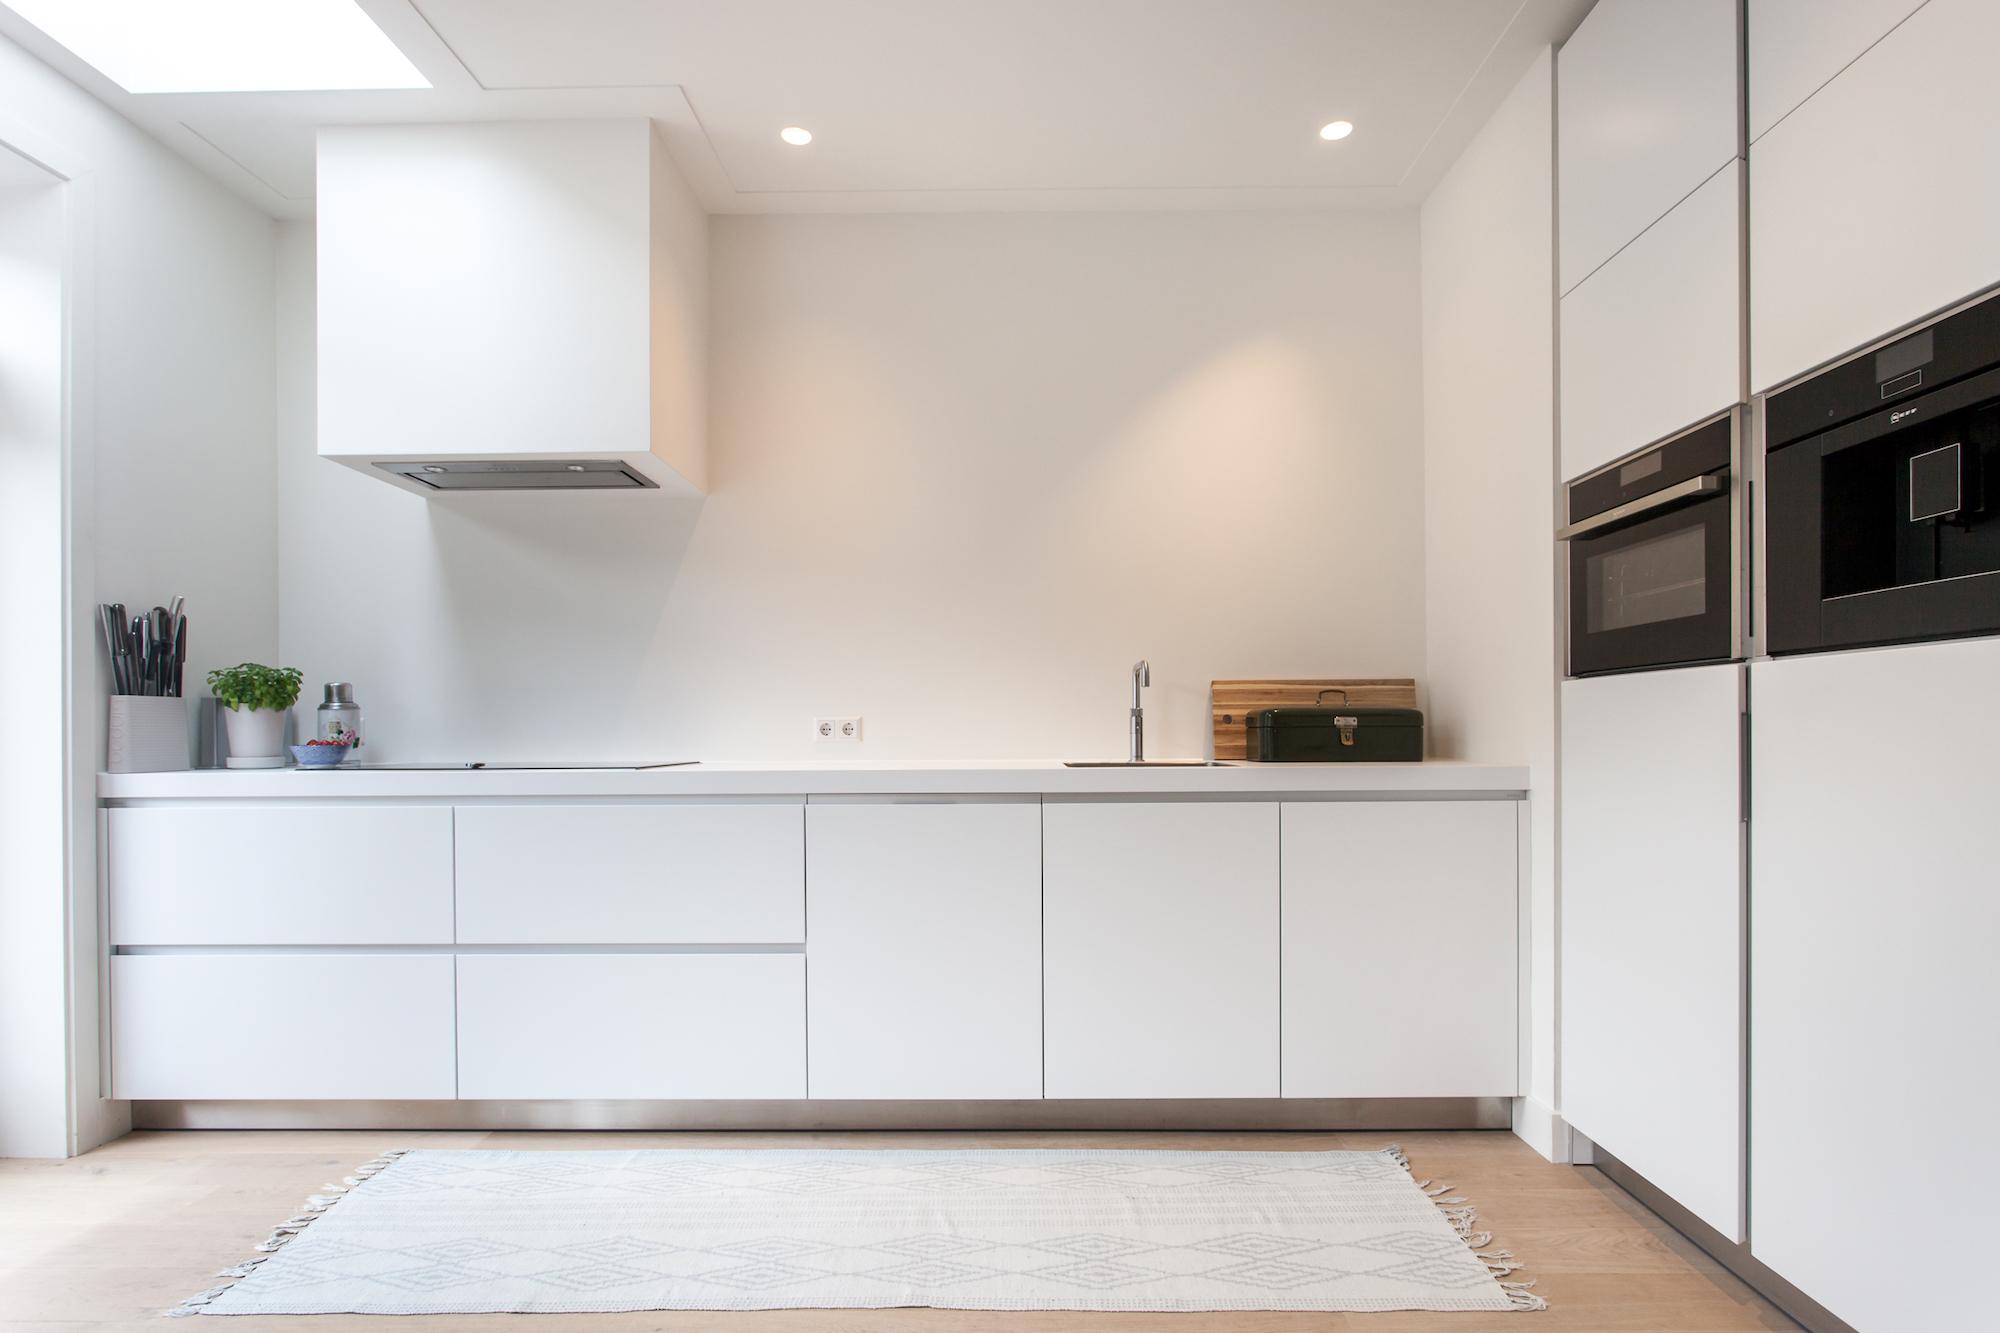 Keuken Design Nijmegen : Scandinavisch interieur interieurarchitect bob romijnders nijmegen